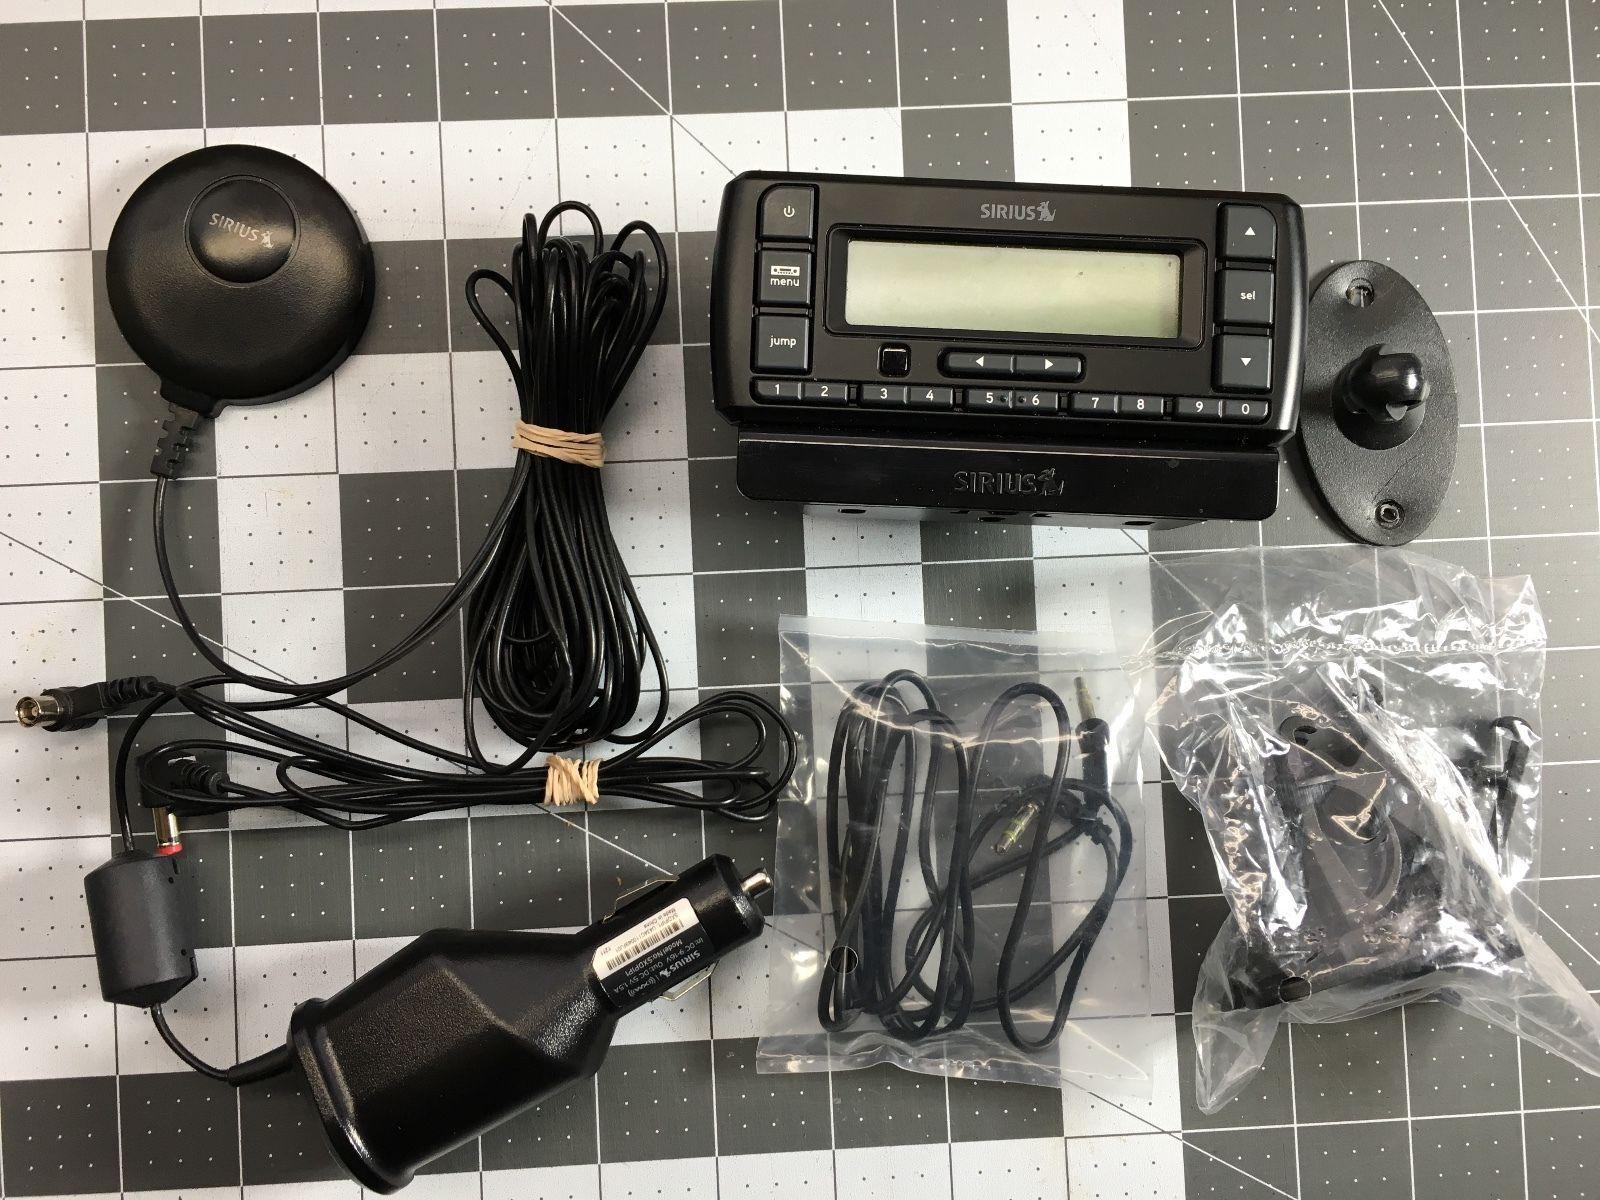 XM XpressEZ Replacement Satellite Radio Receiver ONLY NO CABLES XPRESS EZ E-Z